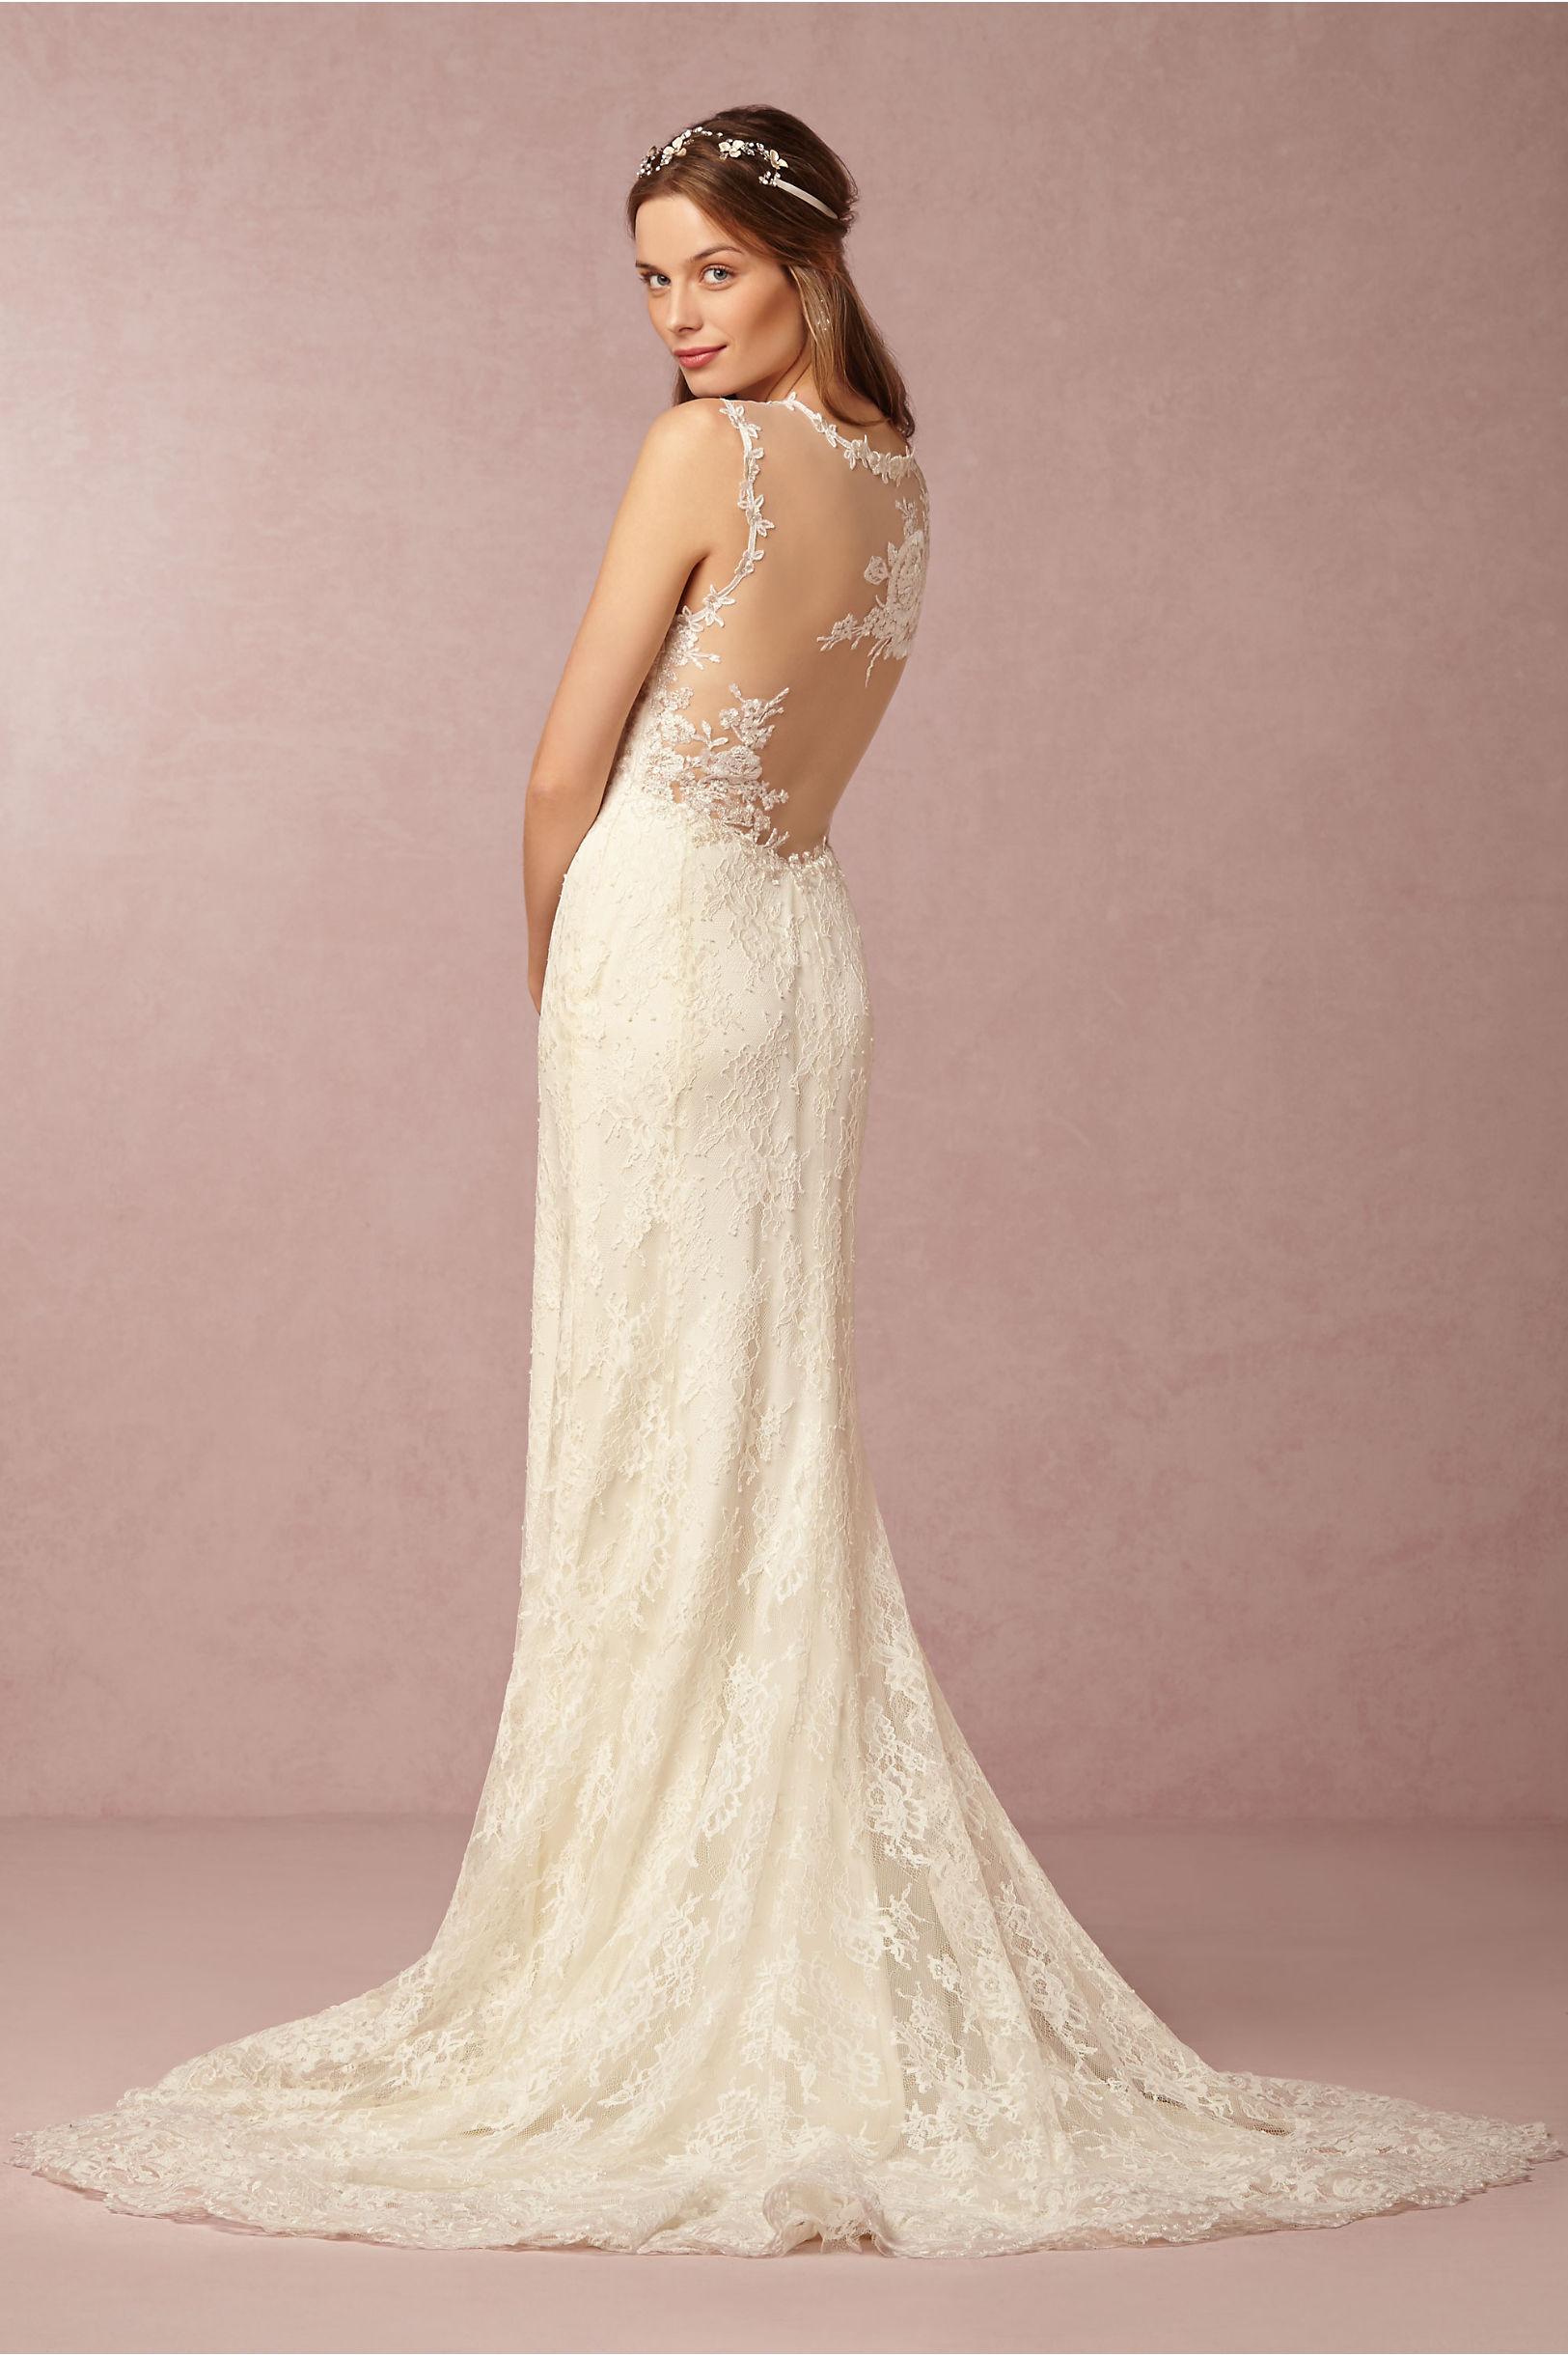 Lace Rose Wedding Dresses – fashion dresses